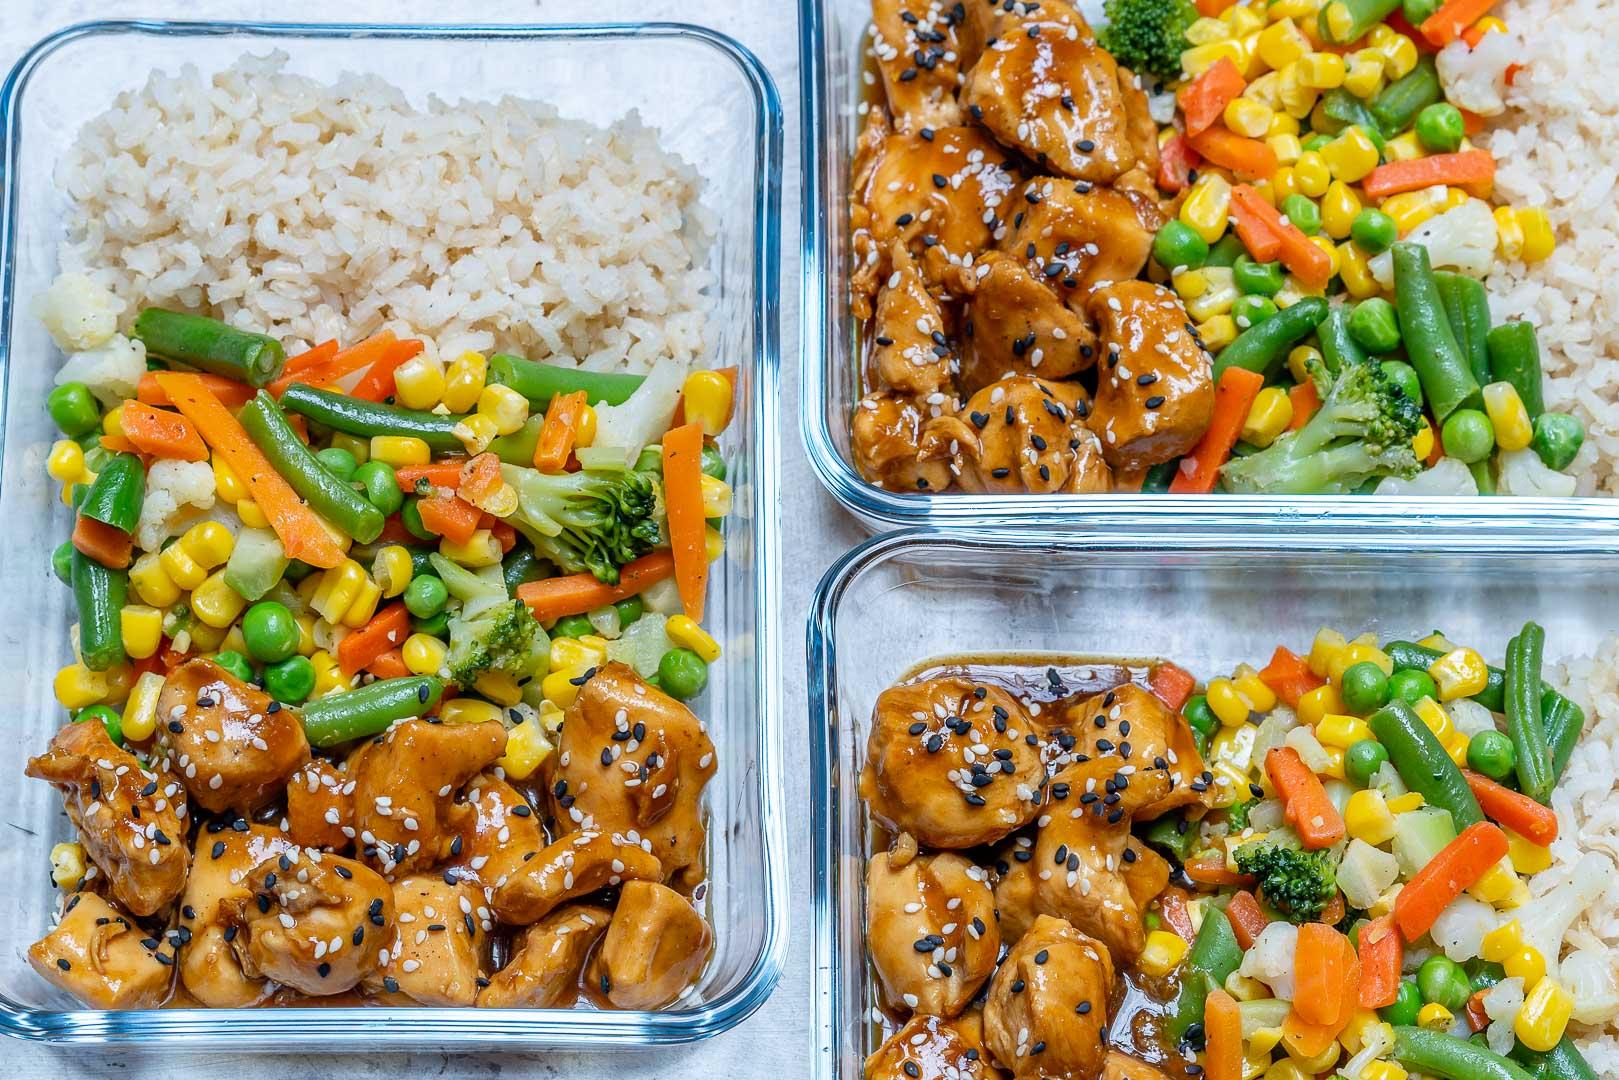 Healthy Meal-Prep Teriyaki Chicken Bowls